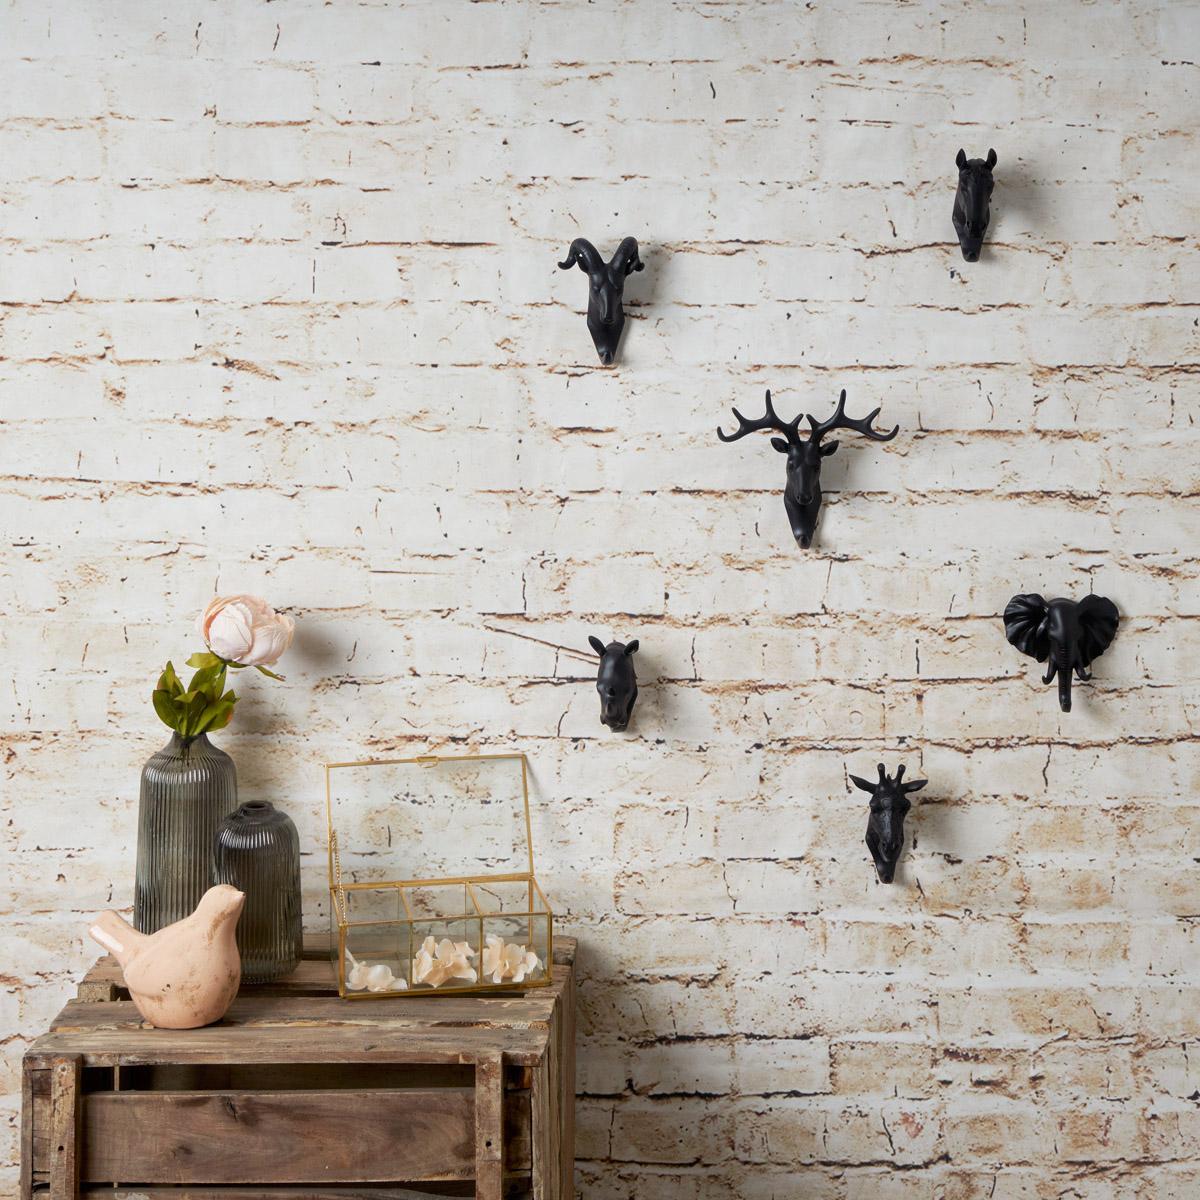 Wall Hook Hanger Polyresin Animal Color Black Rhino RHINO Decorative Perchero 10 * 5 * 11 cm